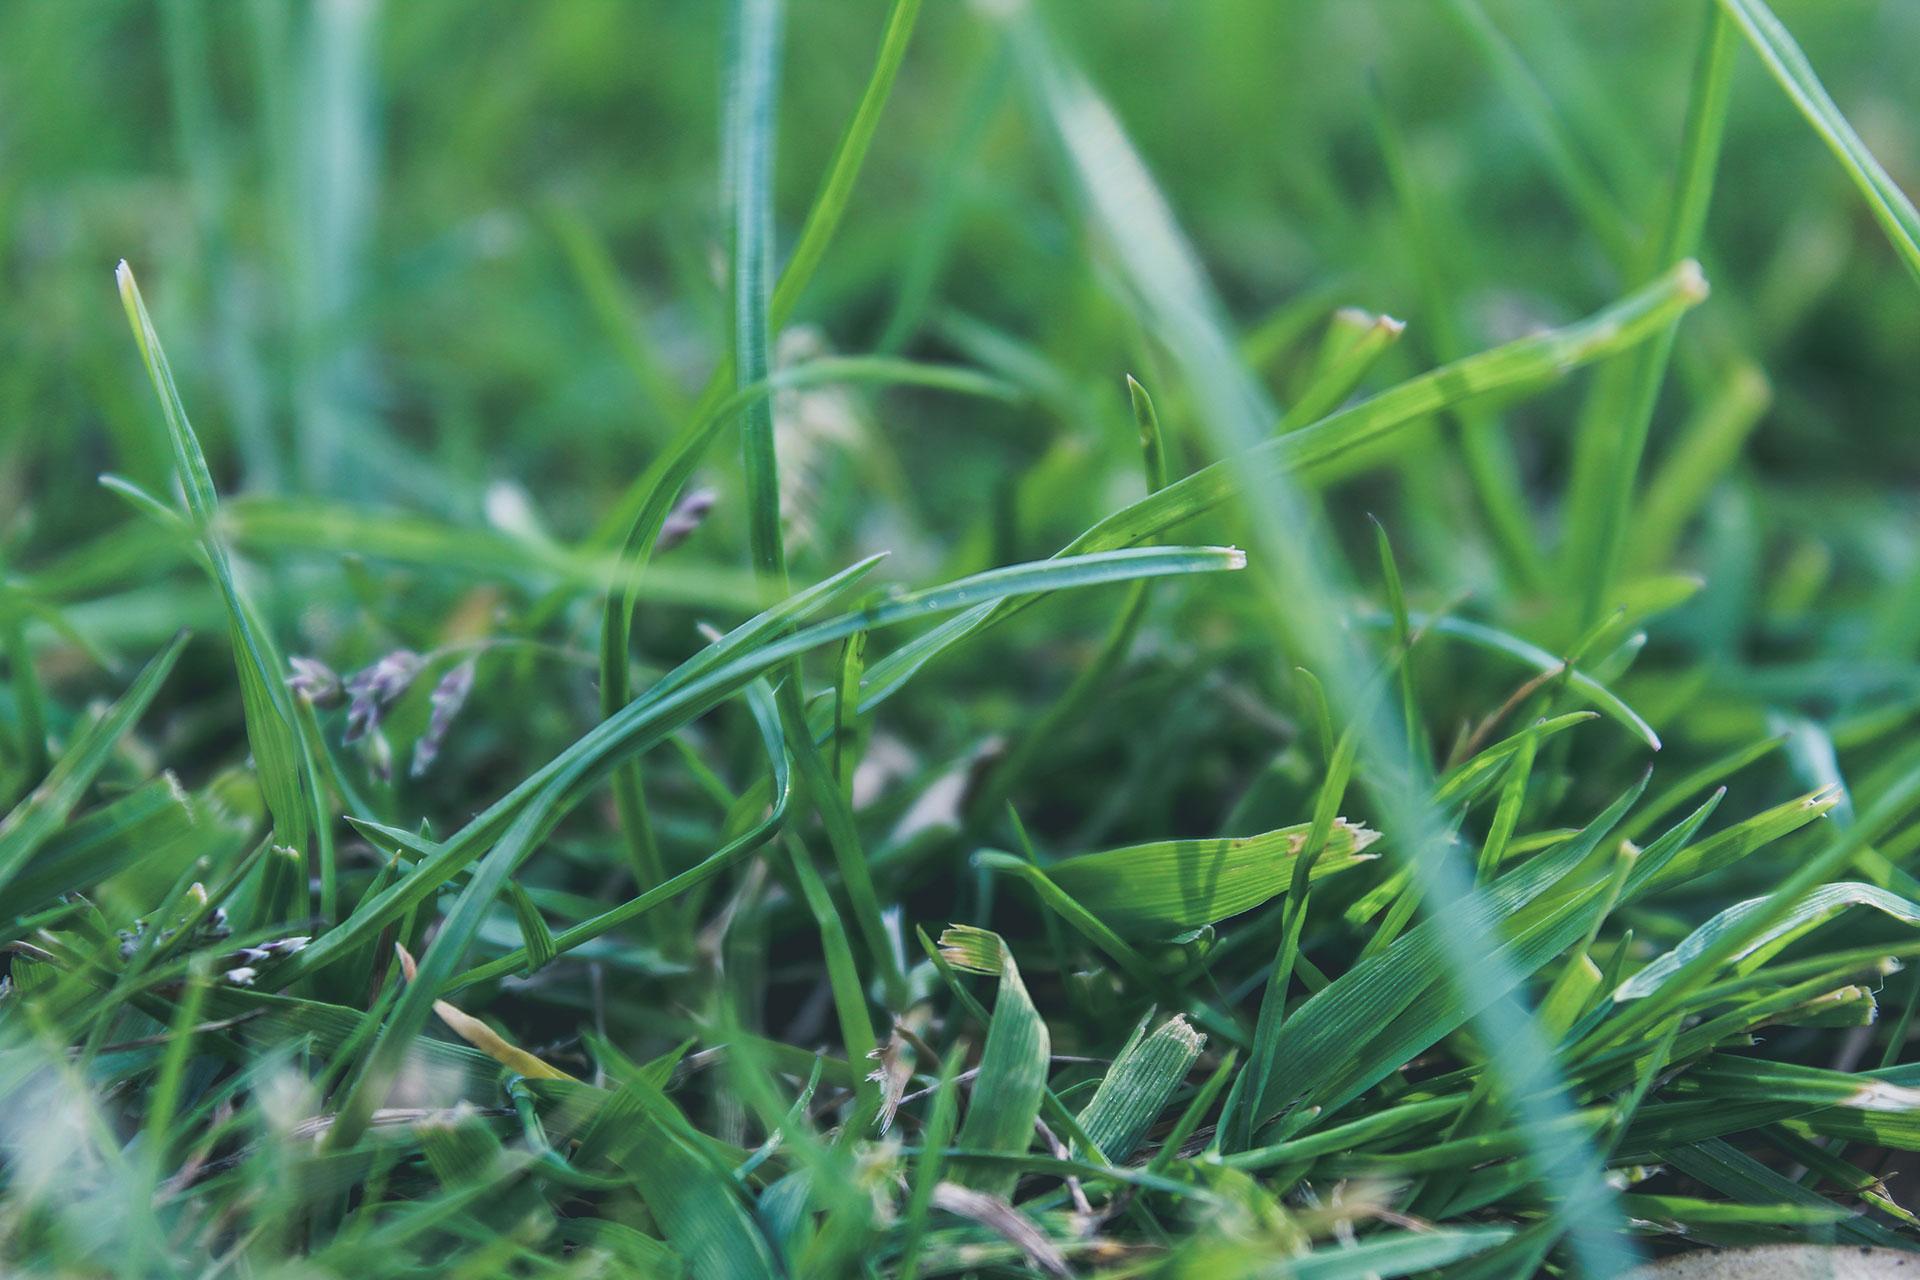 Preventing Crabgrass